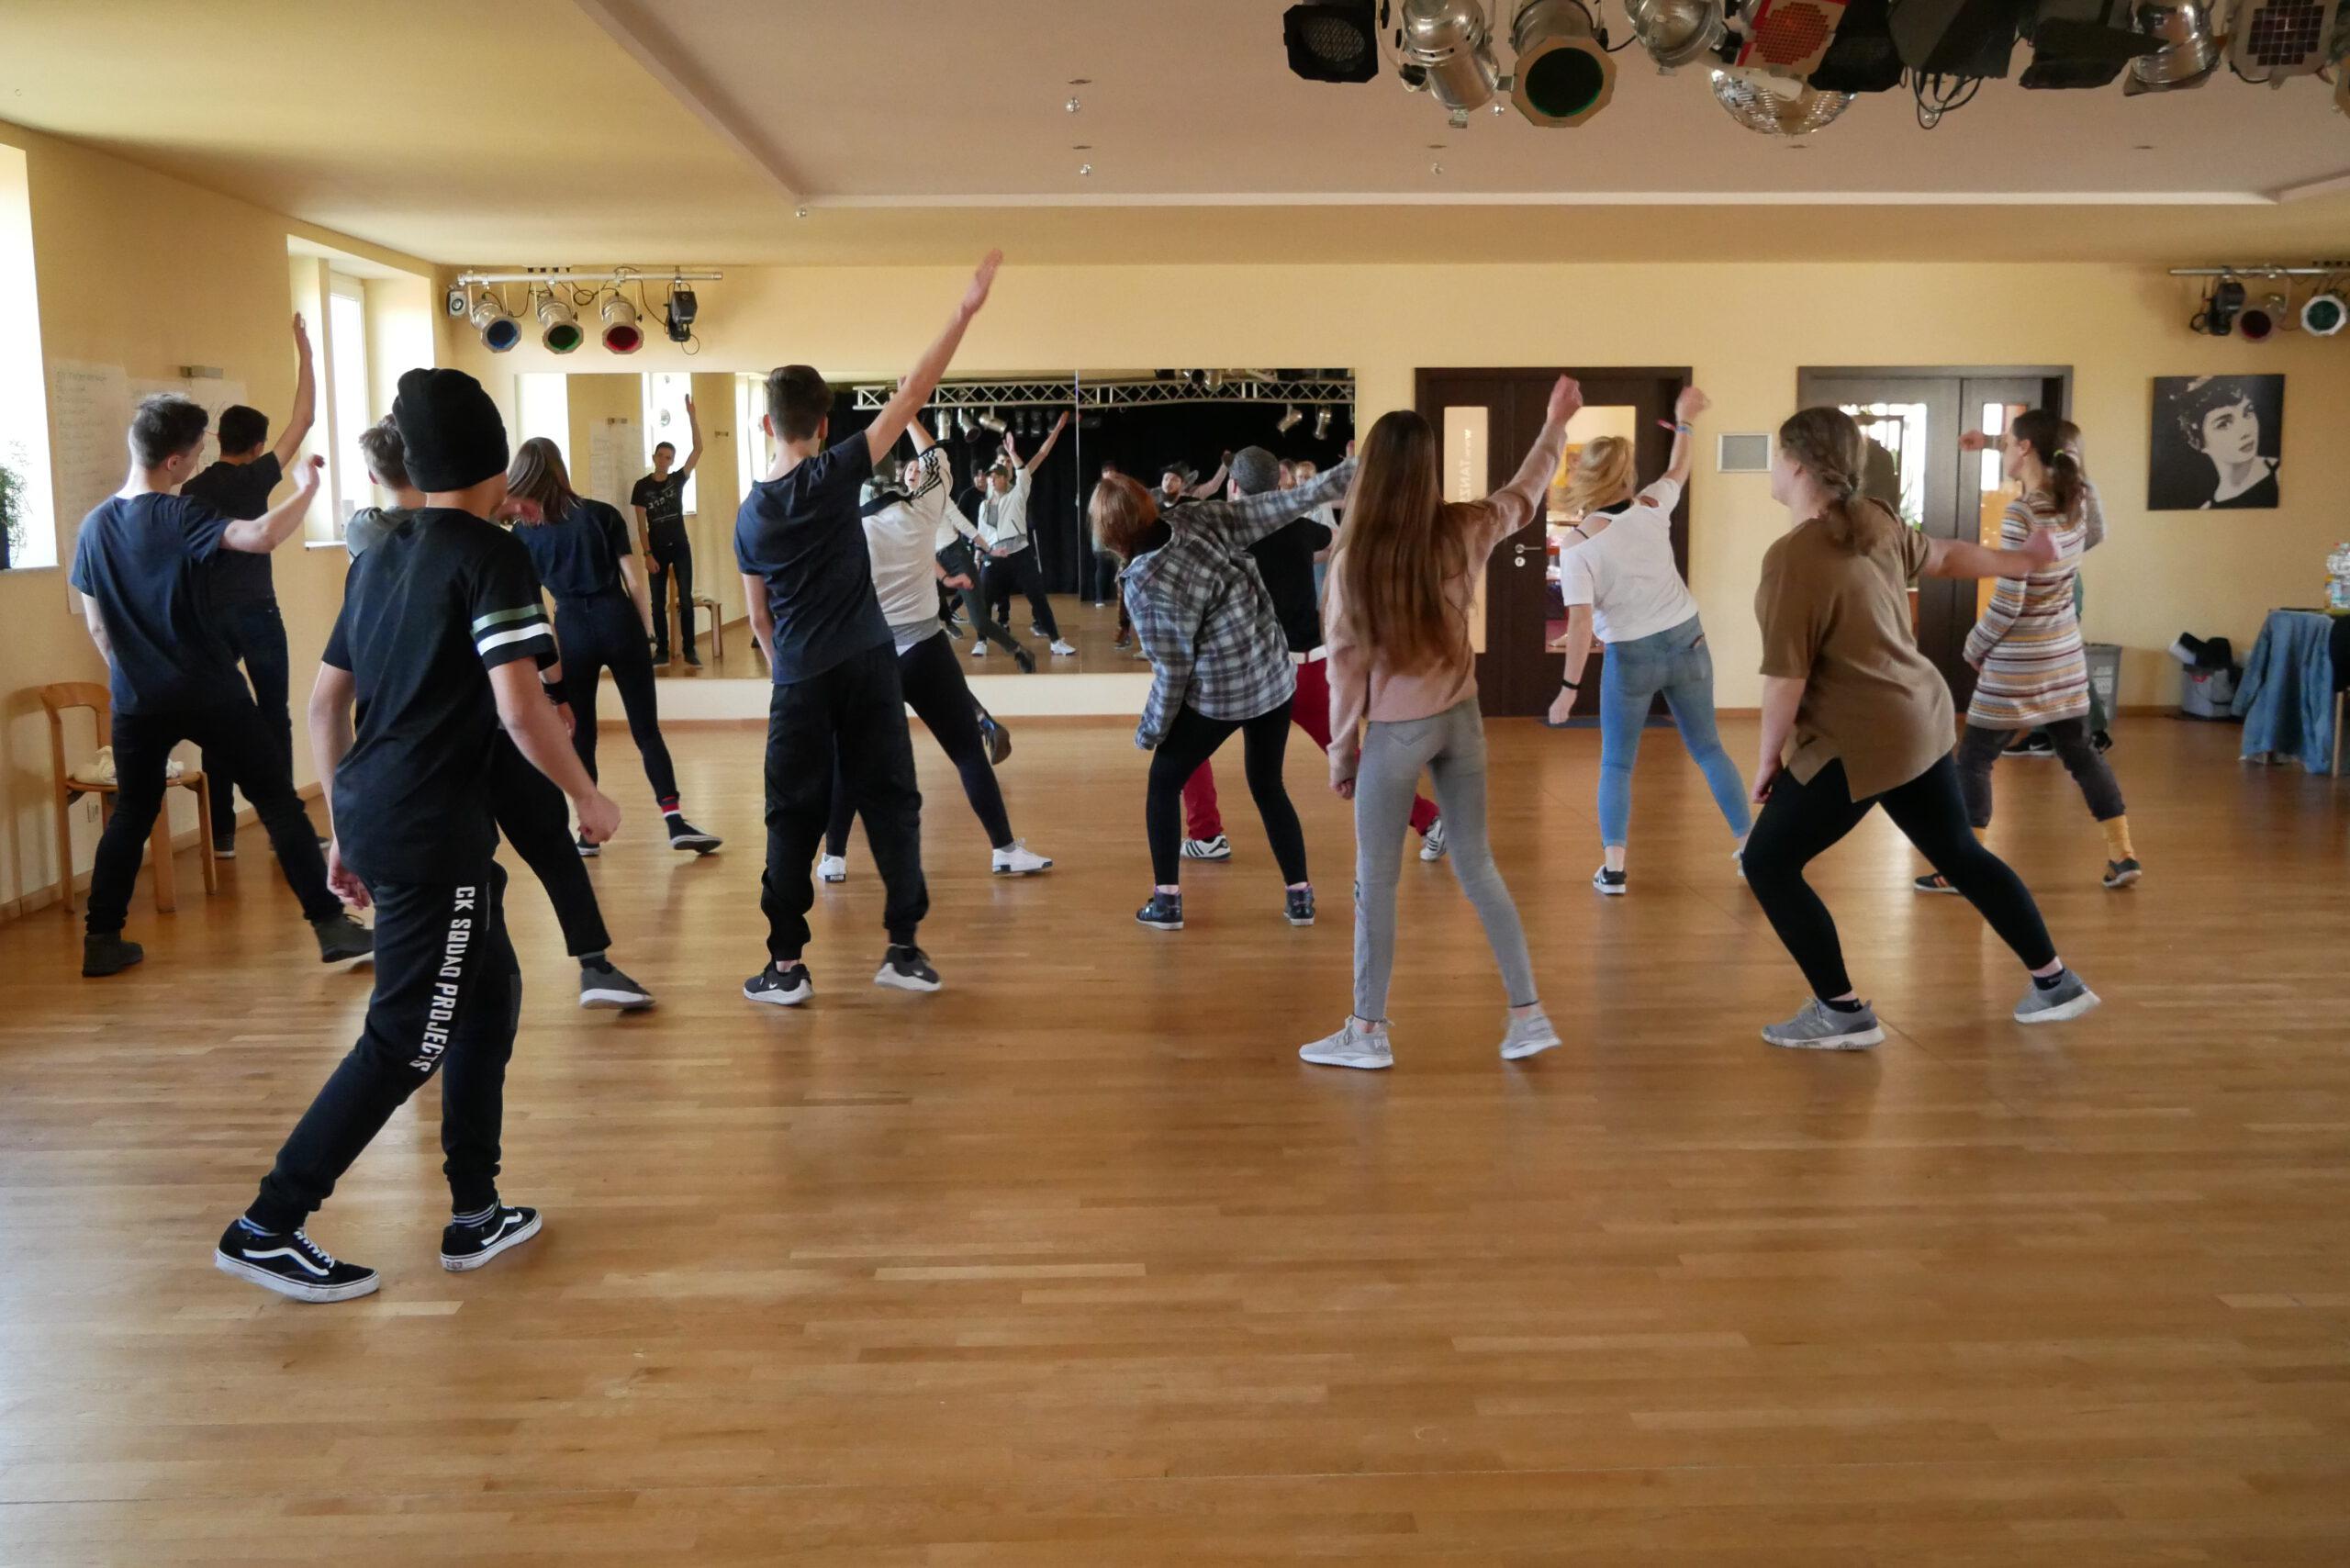 Tanzworkshop beim HipHop Workshop im Februar 2020